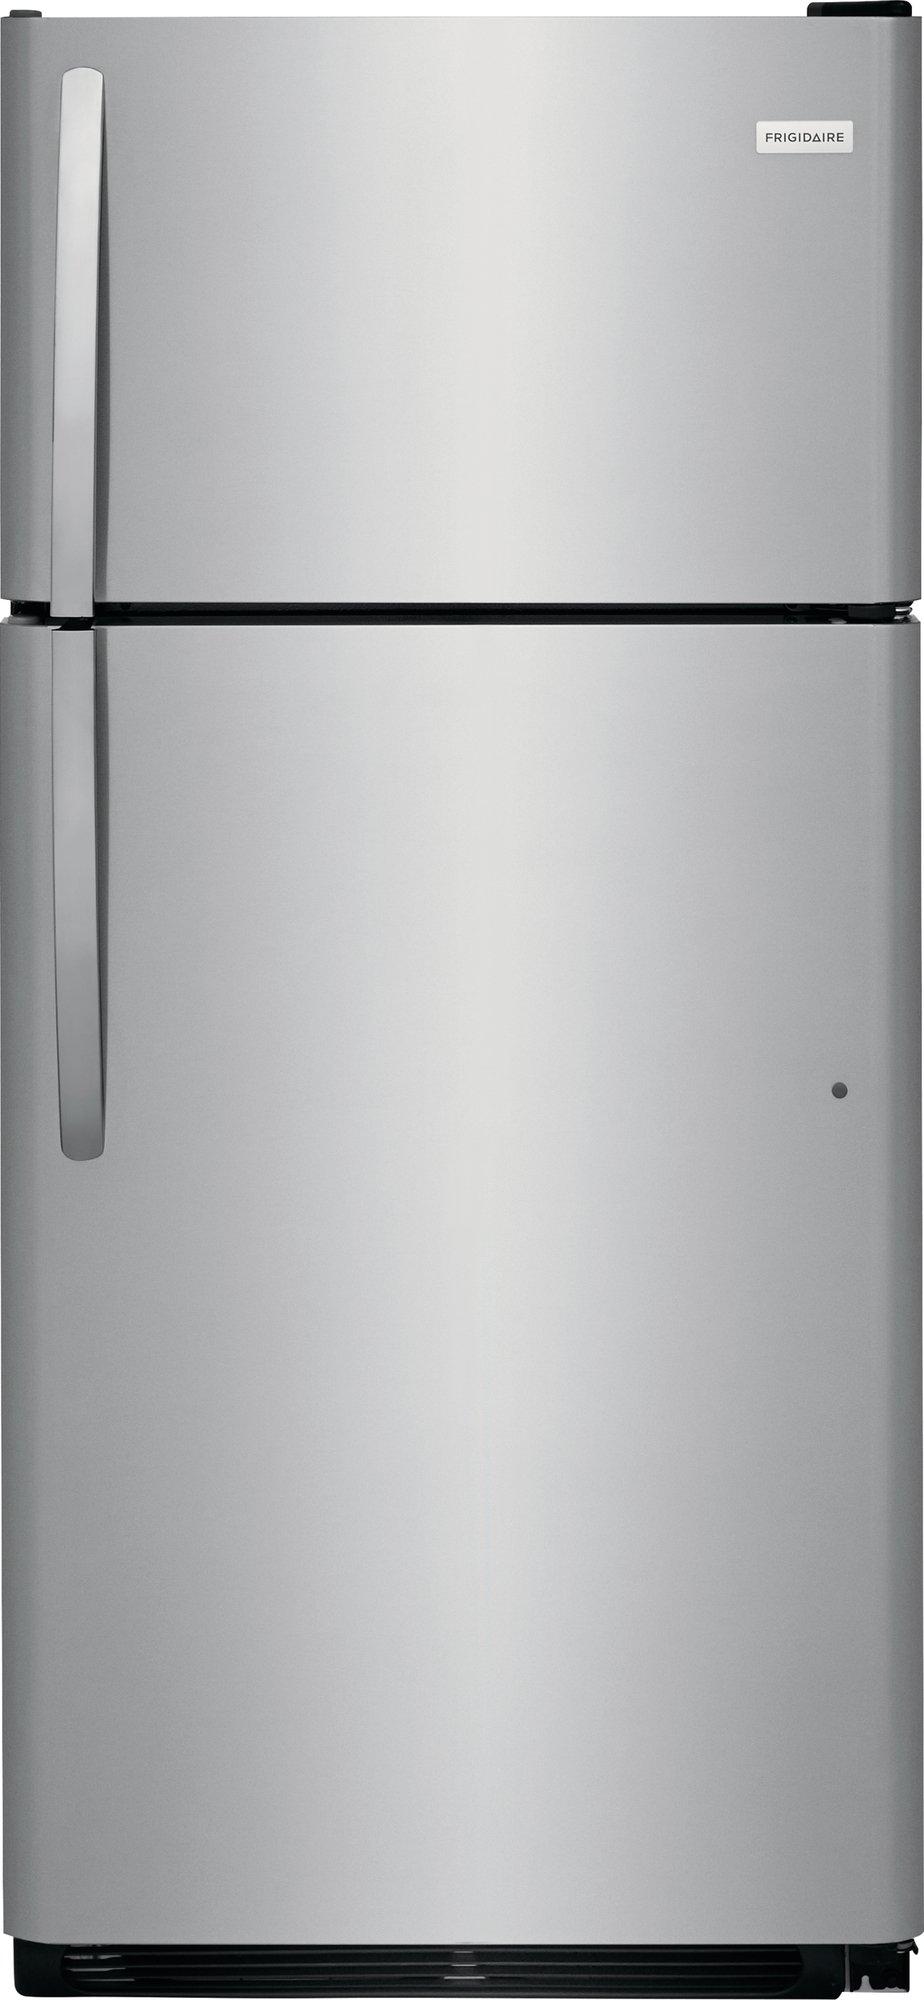 FFTR1821TS Frigidaire 30 Inch Top Freezer Refrigerator - Stainless Steel